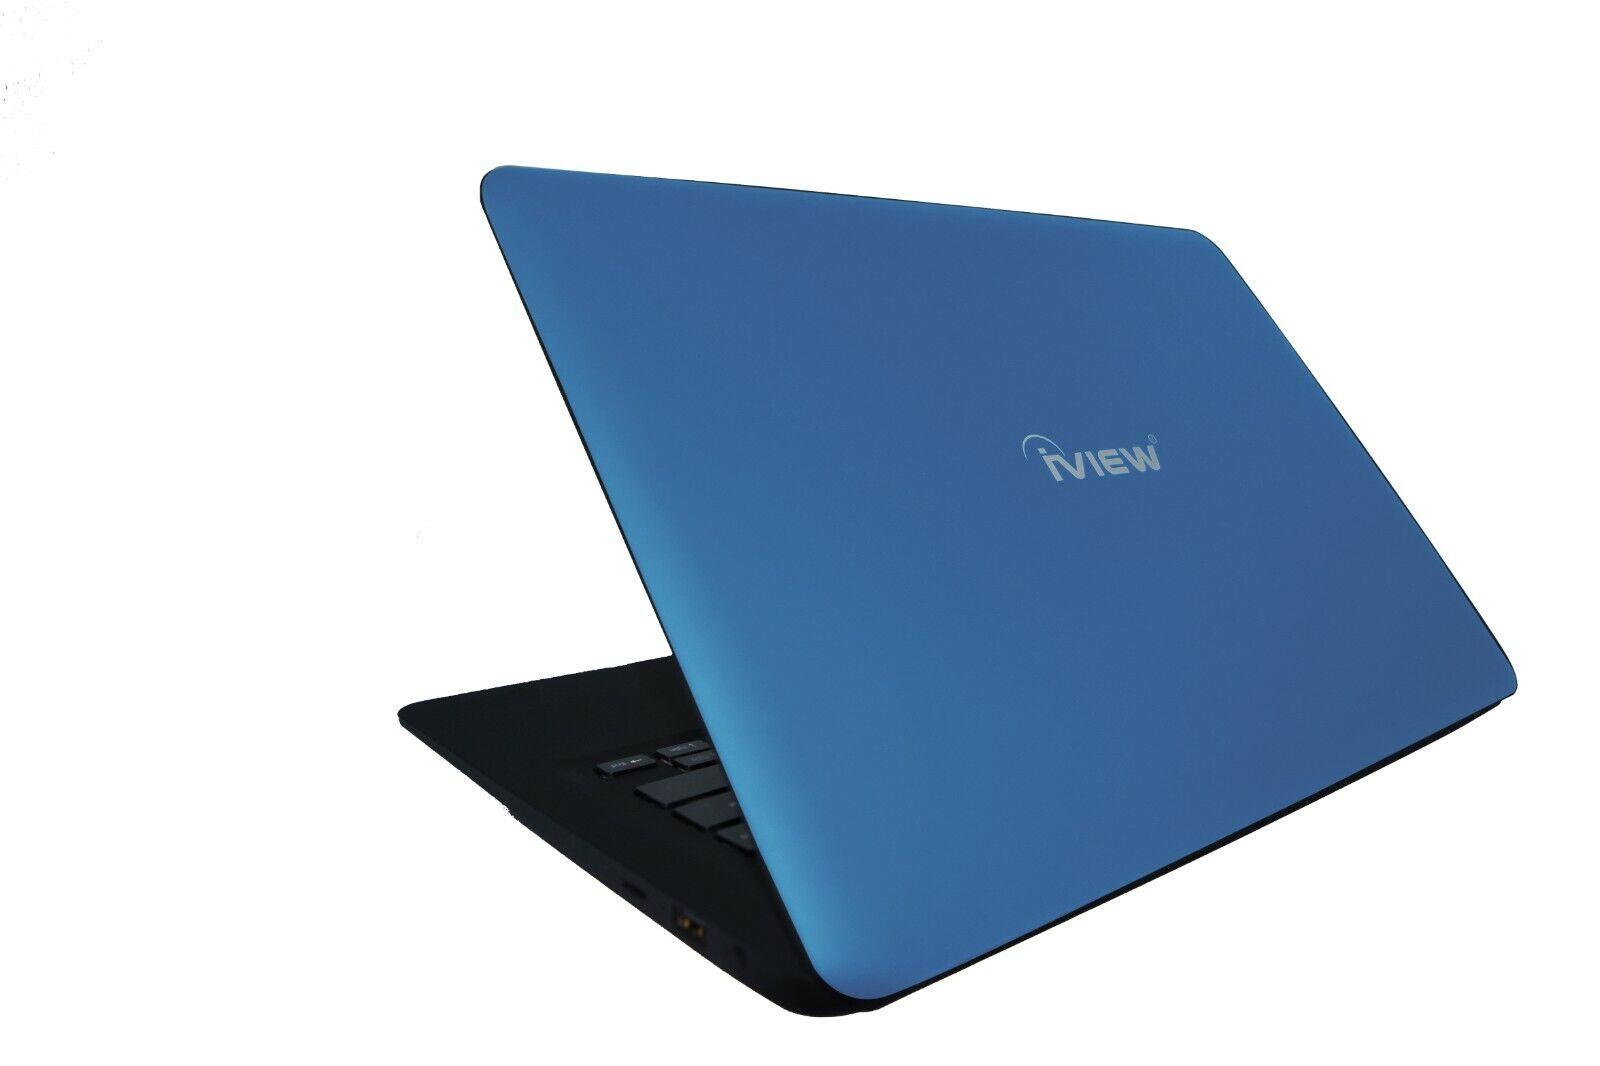 "Laptop Windows - iView 1330NB 13.3"" Ultra Slim Windows Laptop, Bluetooth WiFi, Built-In Webcam"